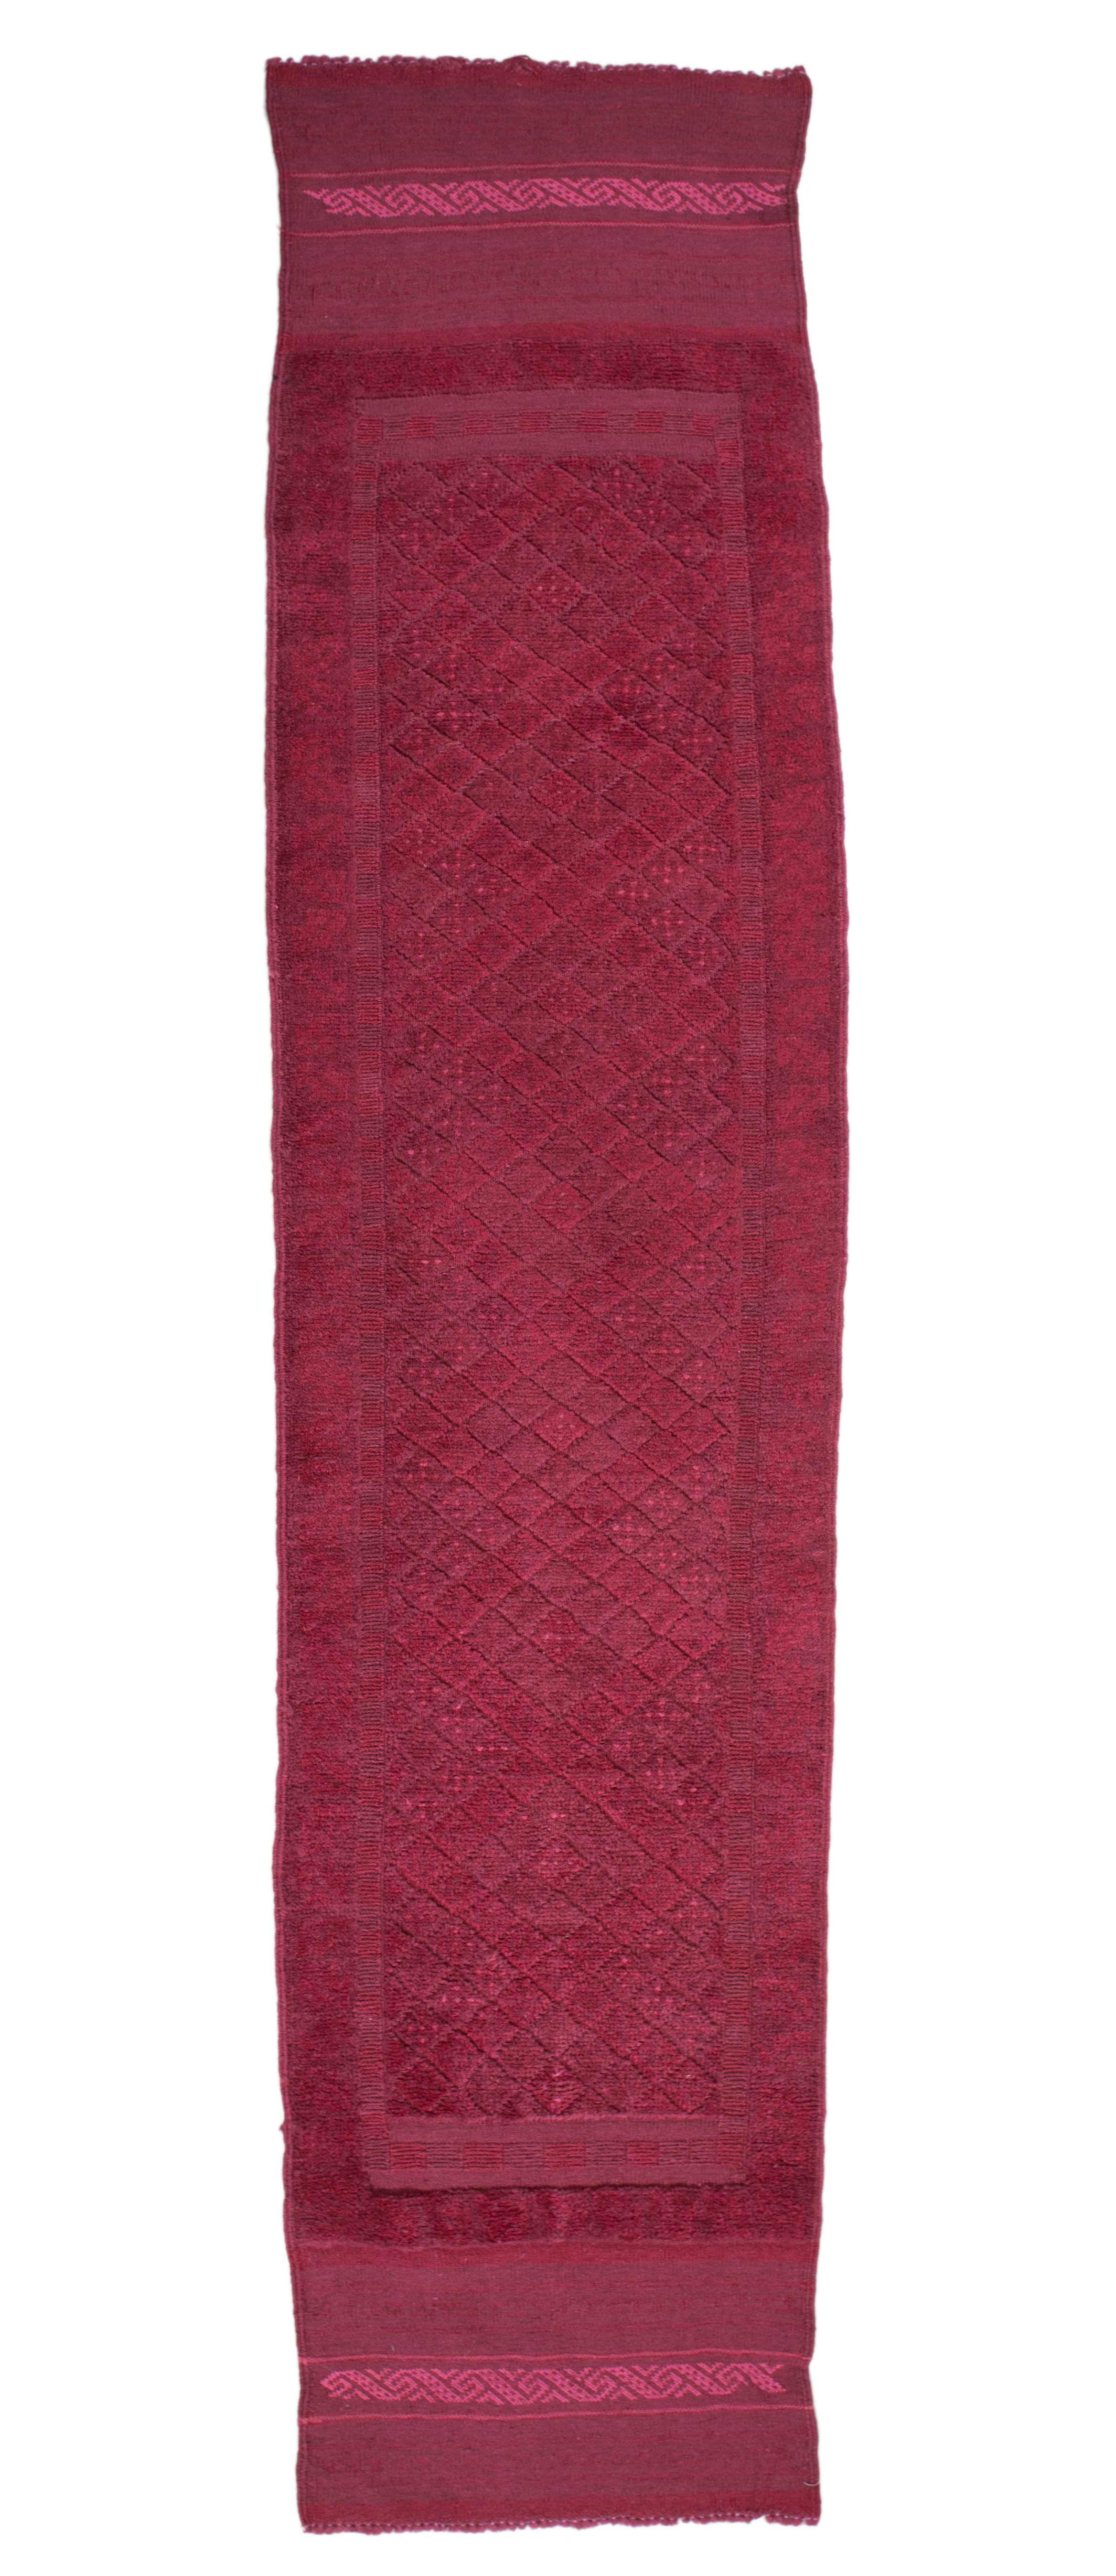 delightful Hot Pink Runner Rug Part - 7: 2×9 Overdyed Vintage Tribal Hot Pink Runner 2503